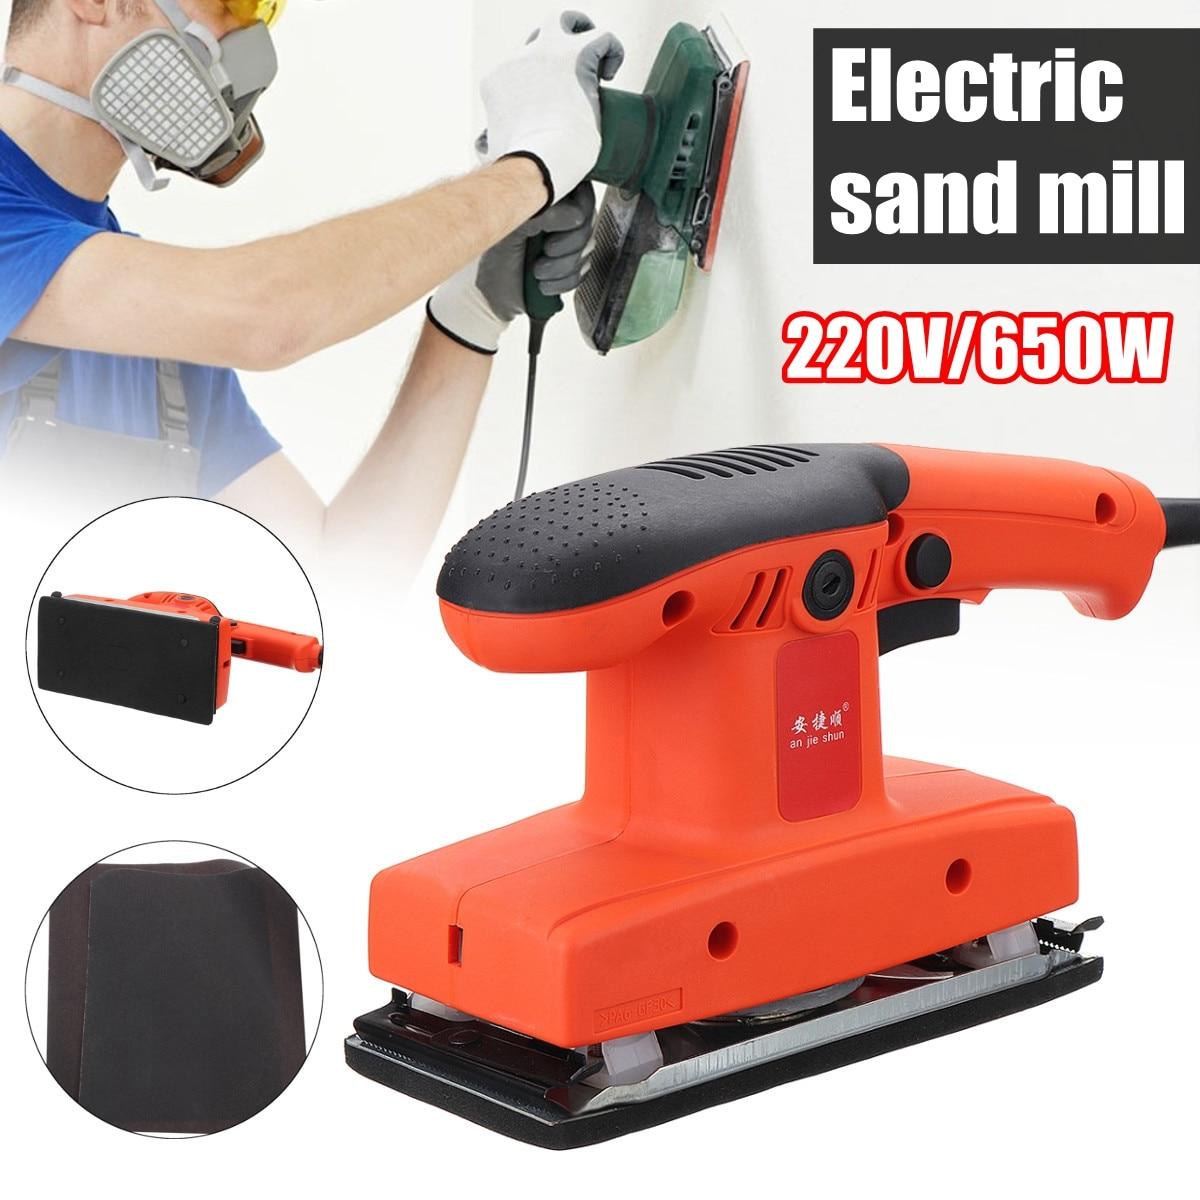 цена на 650W 12000rpm/min Electric Sand Mill Plane Grinding Machine Electric Grinder Detail P alm Sander Orbital Polishing Sanding+ Pad